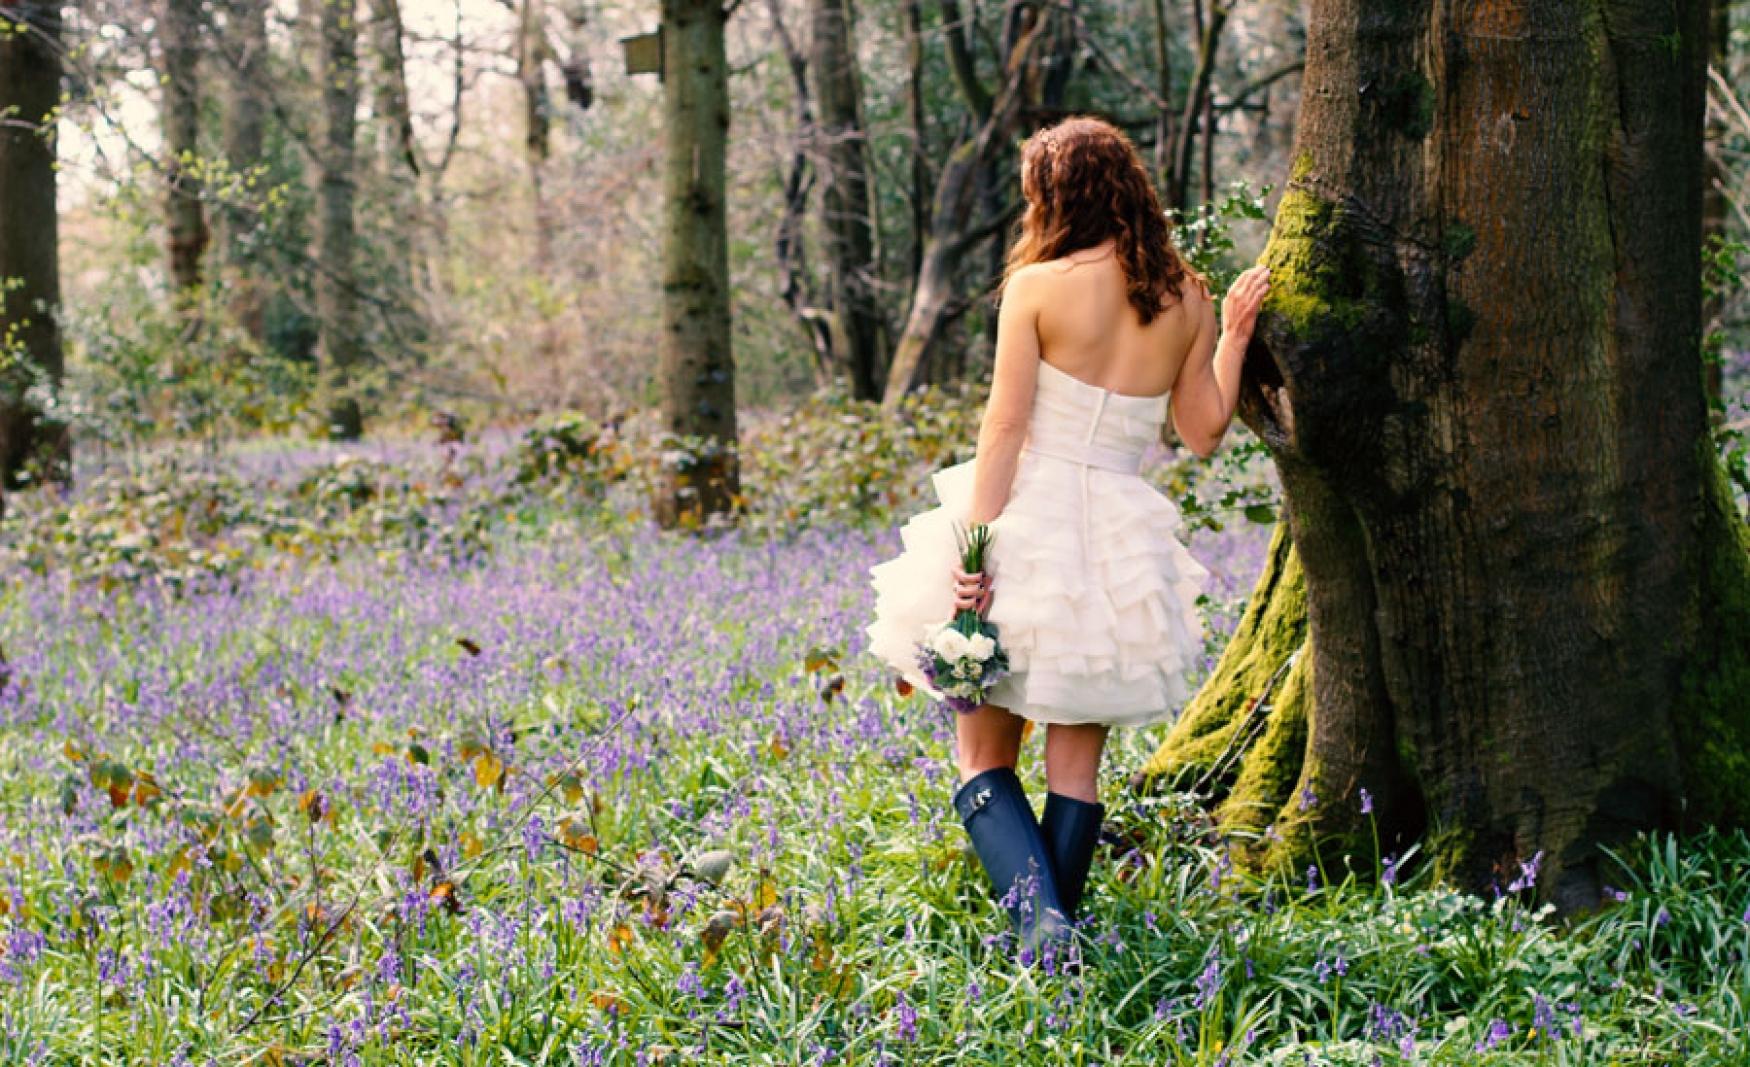 fiesta-fields-outdoor-wedding-events-company-tipi-surrey-sussex-staffhurst-wood-edenbridge-4